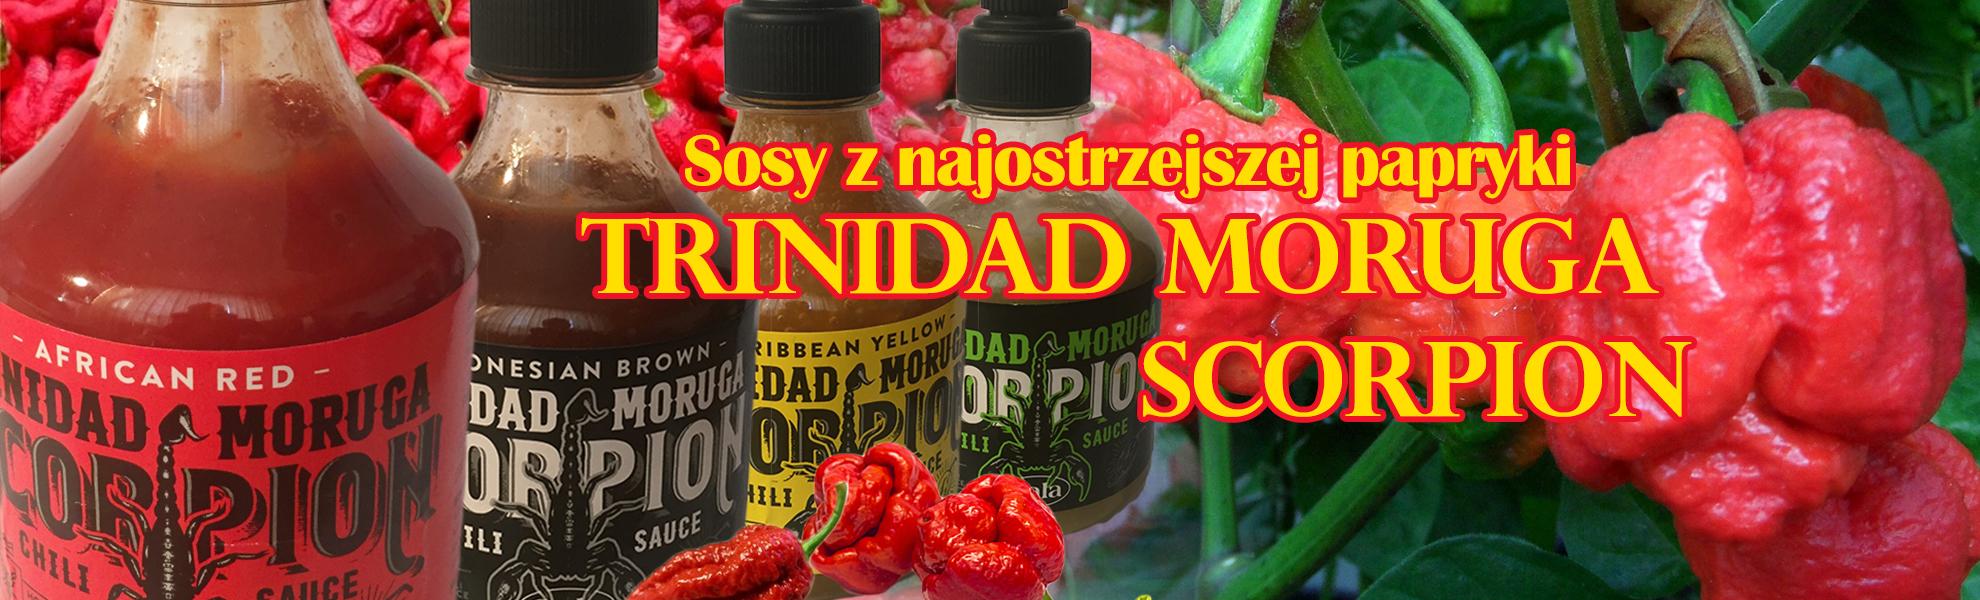 TRINIDAD-MORUGA-SCORPION-s2